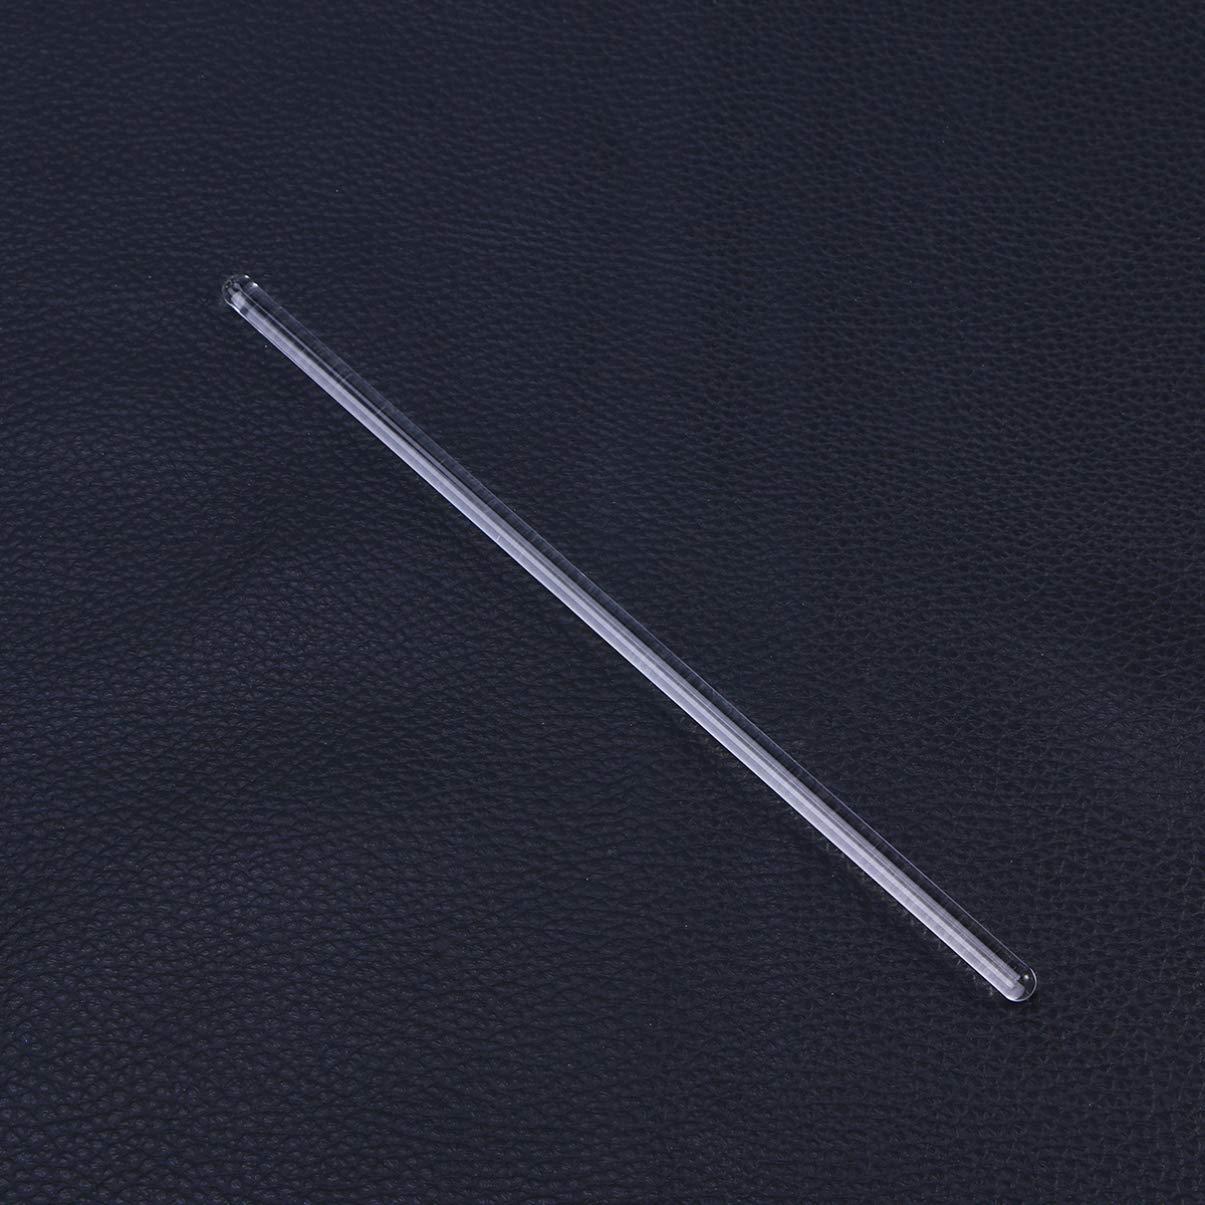 ULTECHNOVO 3pcs 20cm Glass Stirring Rod,Glass Buret Mixer Transparent,Reusable Laboratory Tools for Home,Lab